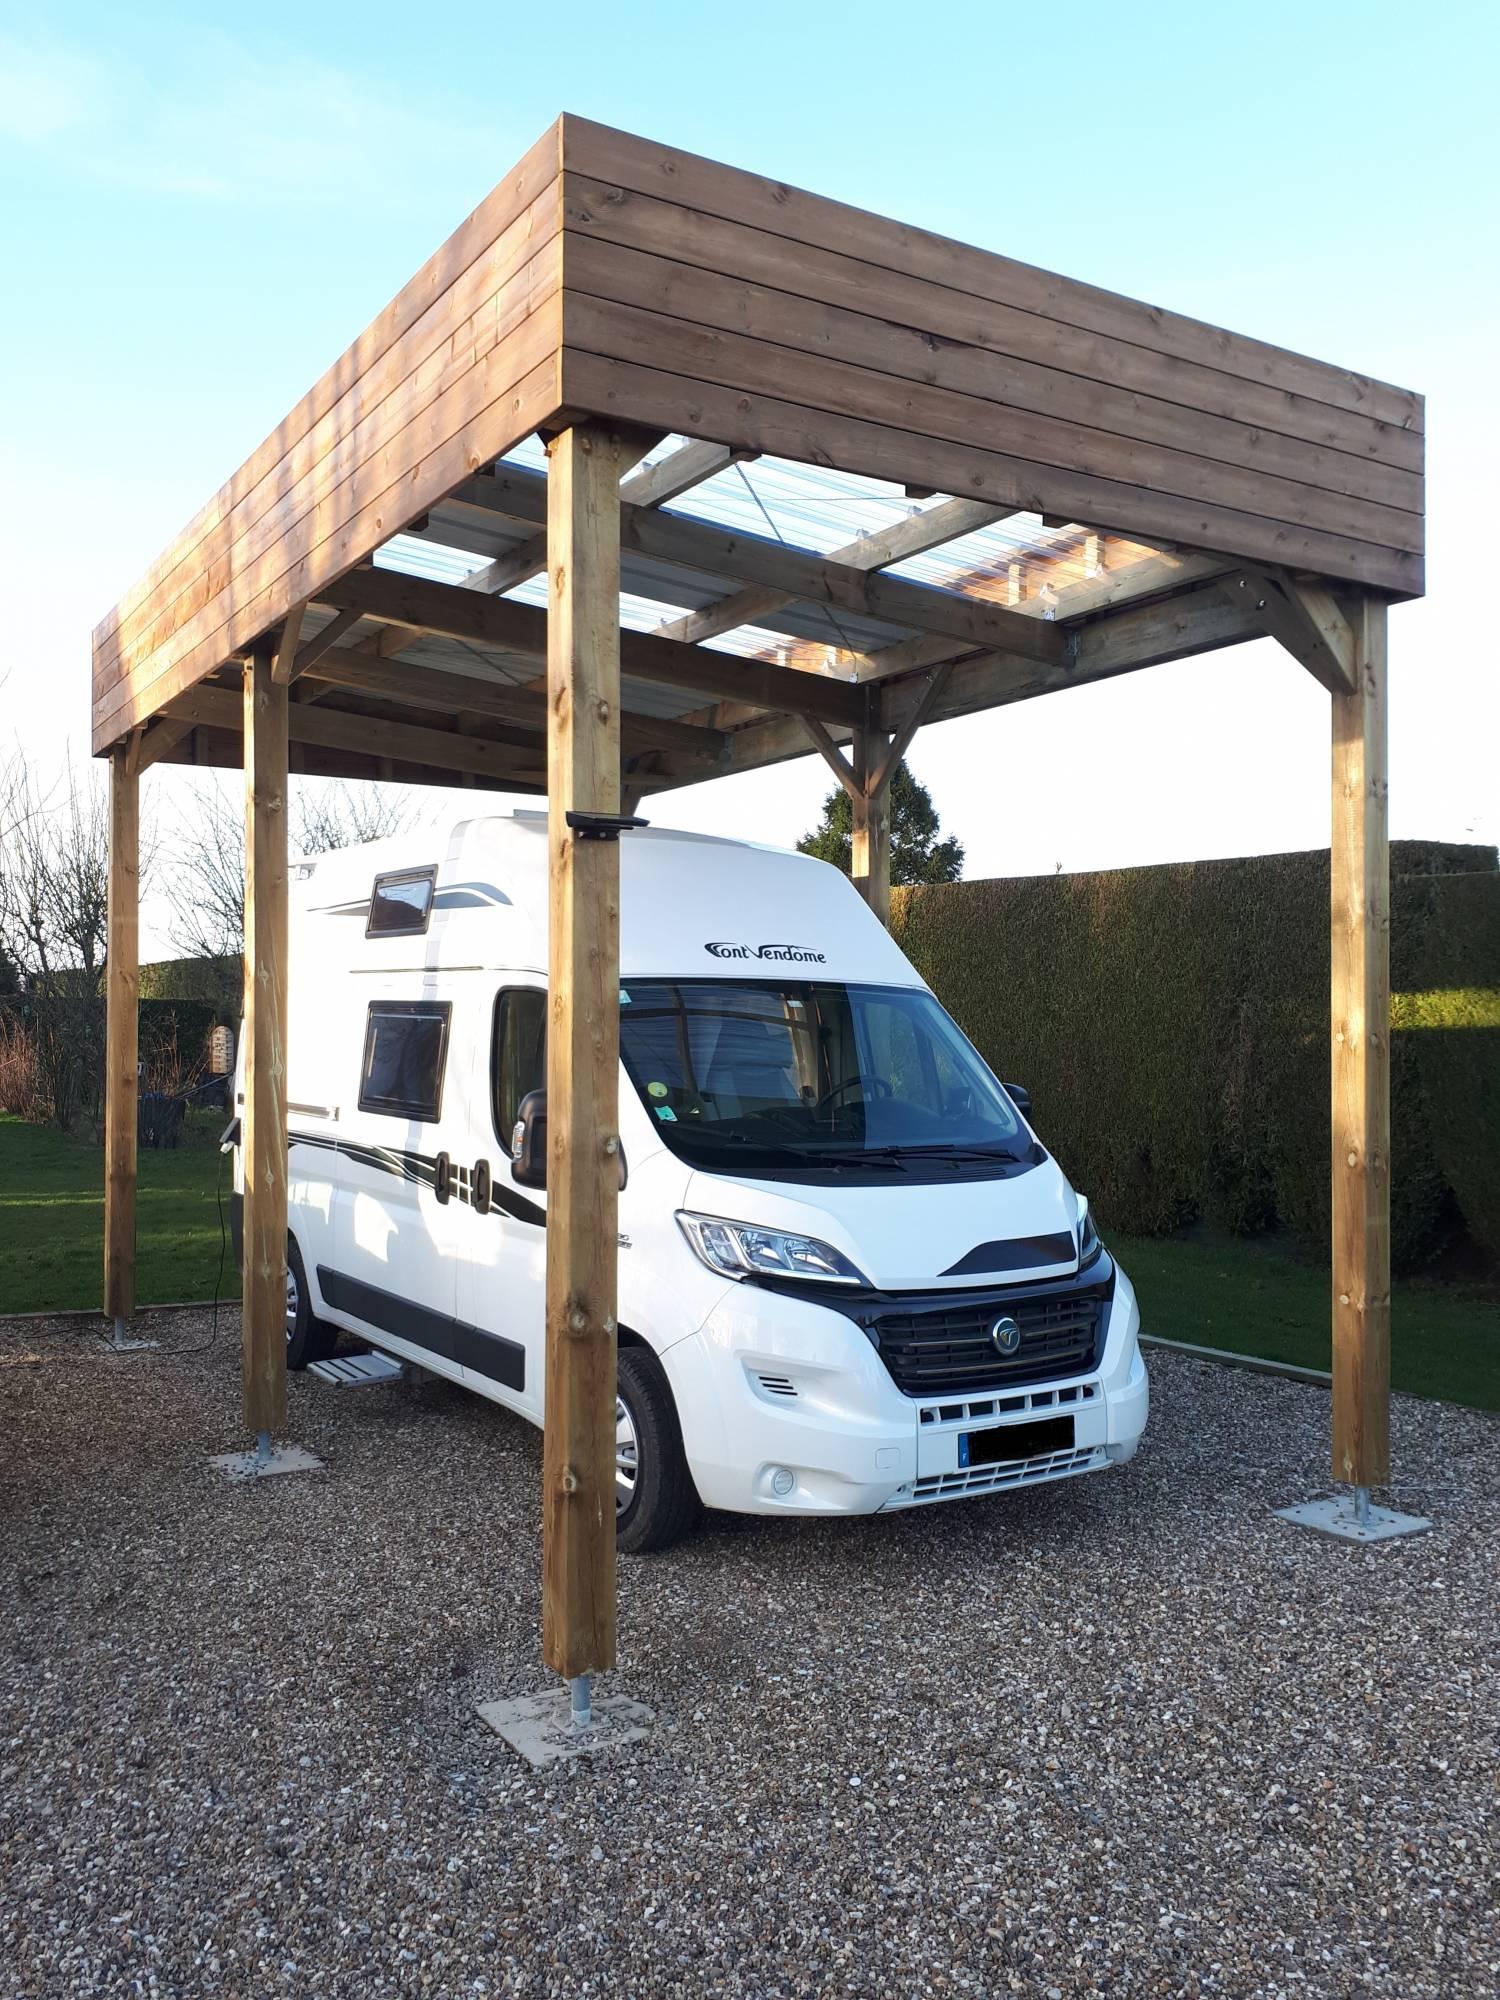 Installation De Carport Pour Camping-Car En Normandie Proche concernant Abri Camping Car Leroy Merlin